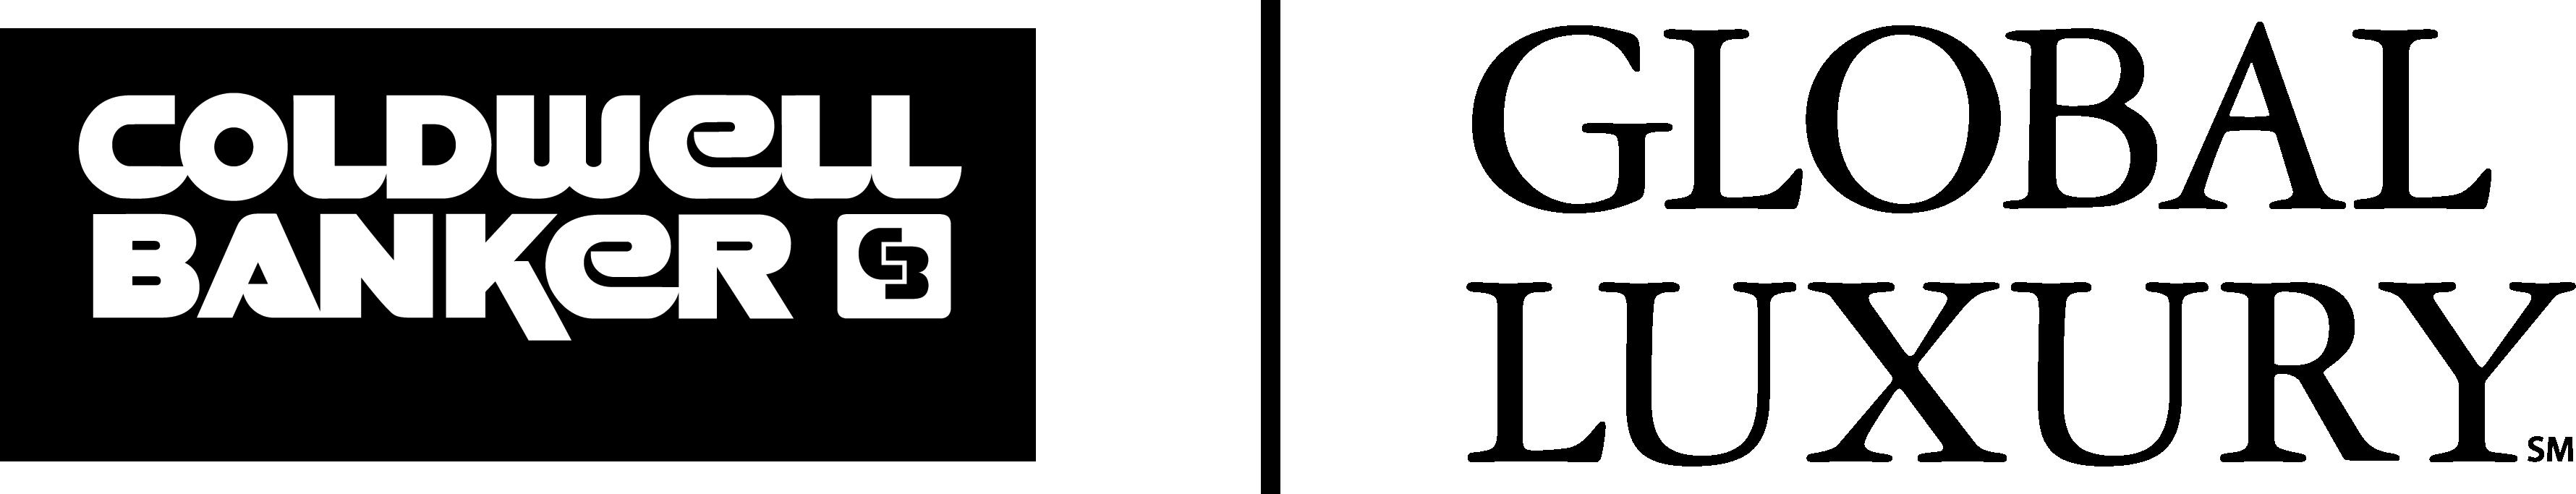 Schoelerman Group - Coldwell Banker Global Luxury logo